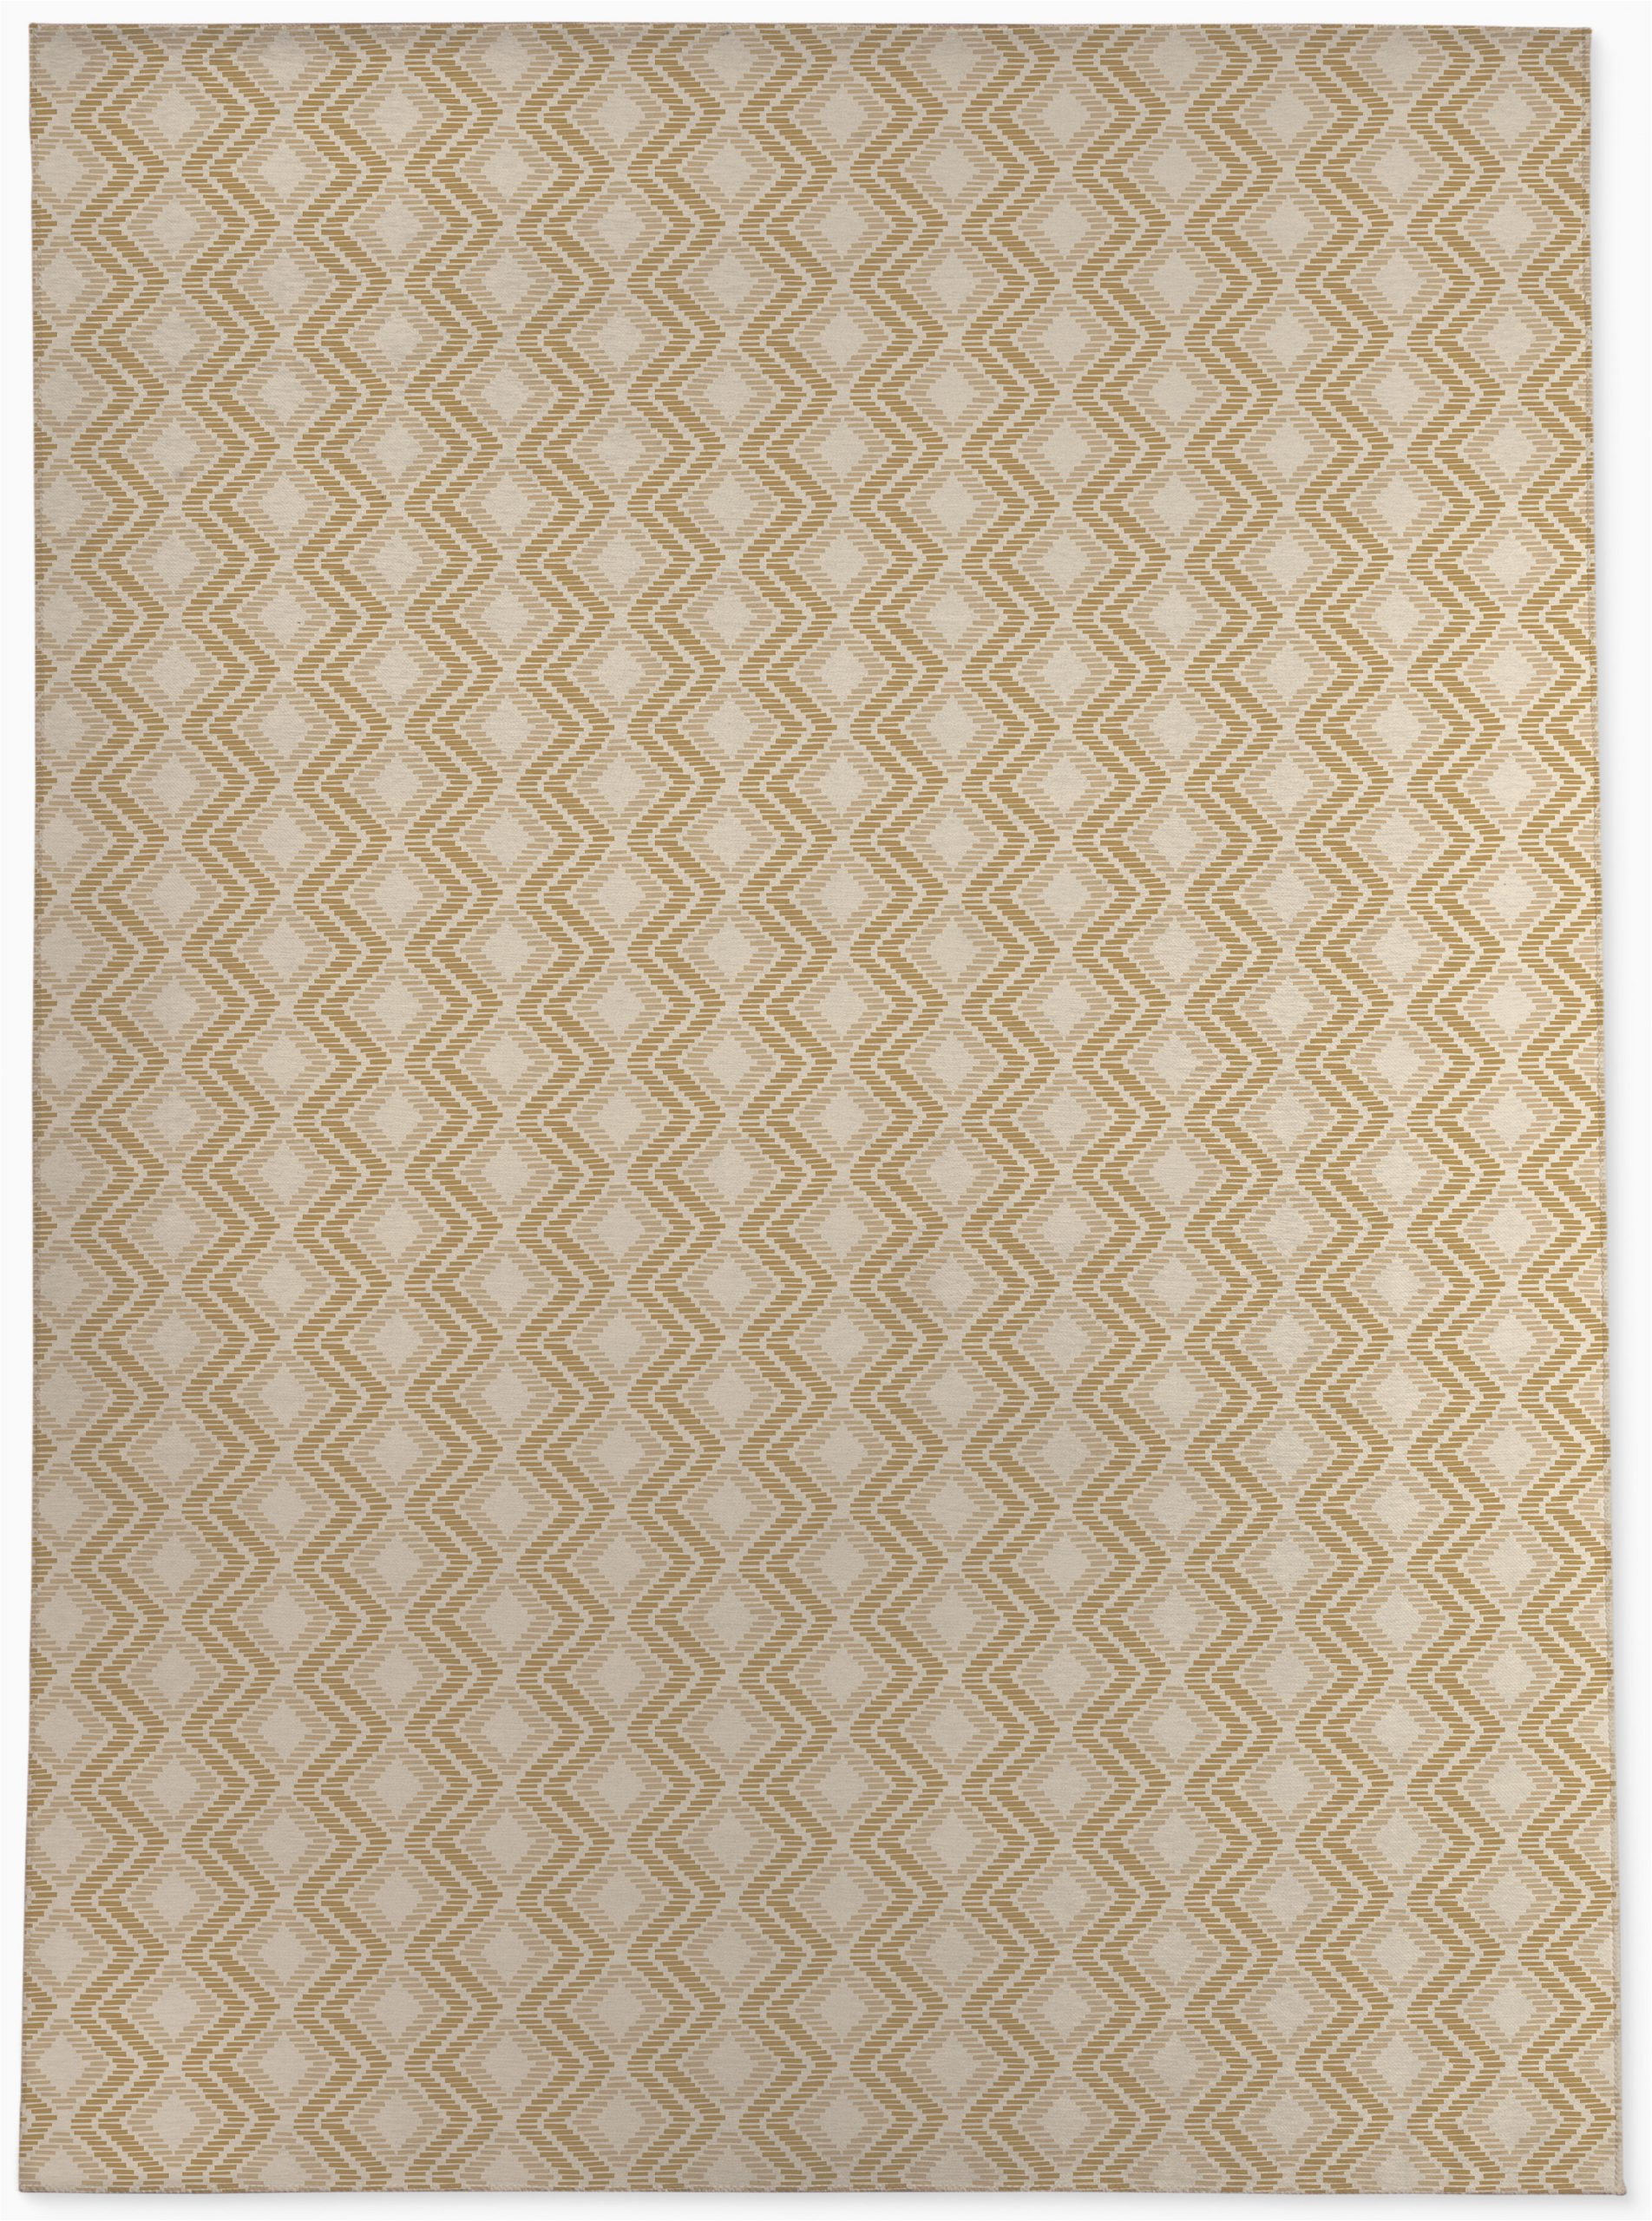 cainhoe yellow area rug